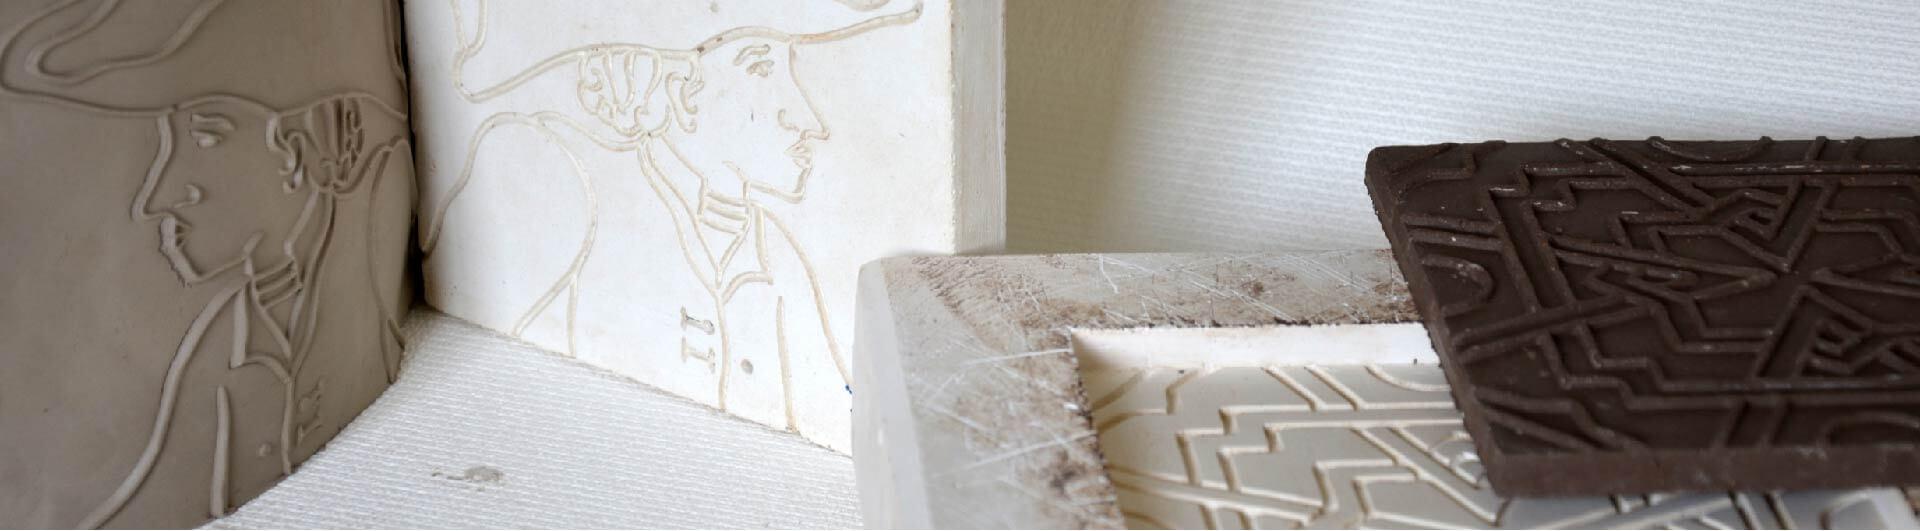 cerdeira-workshop-producao-azulejo-cerdeira